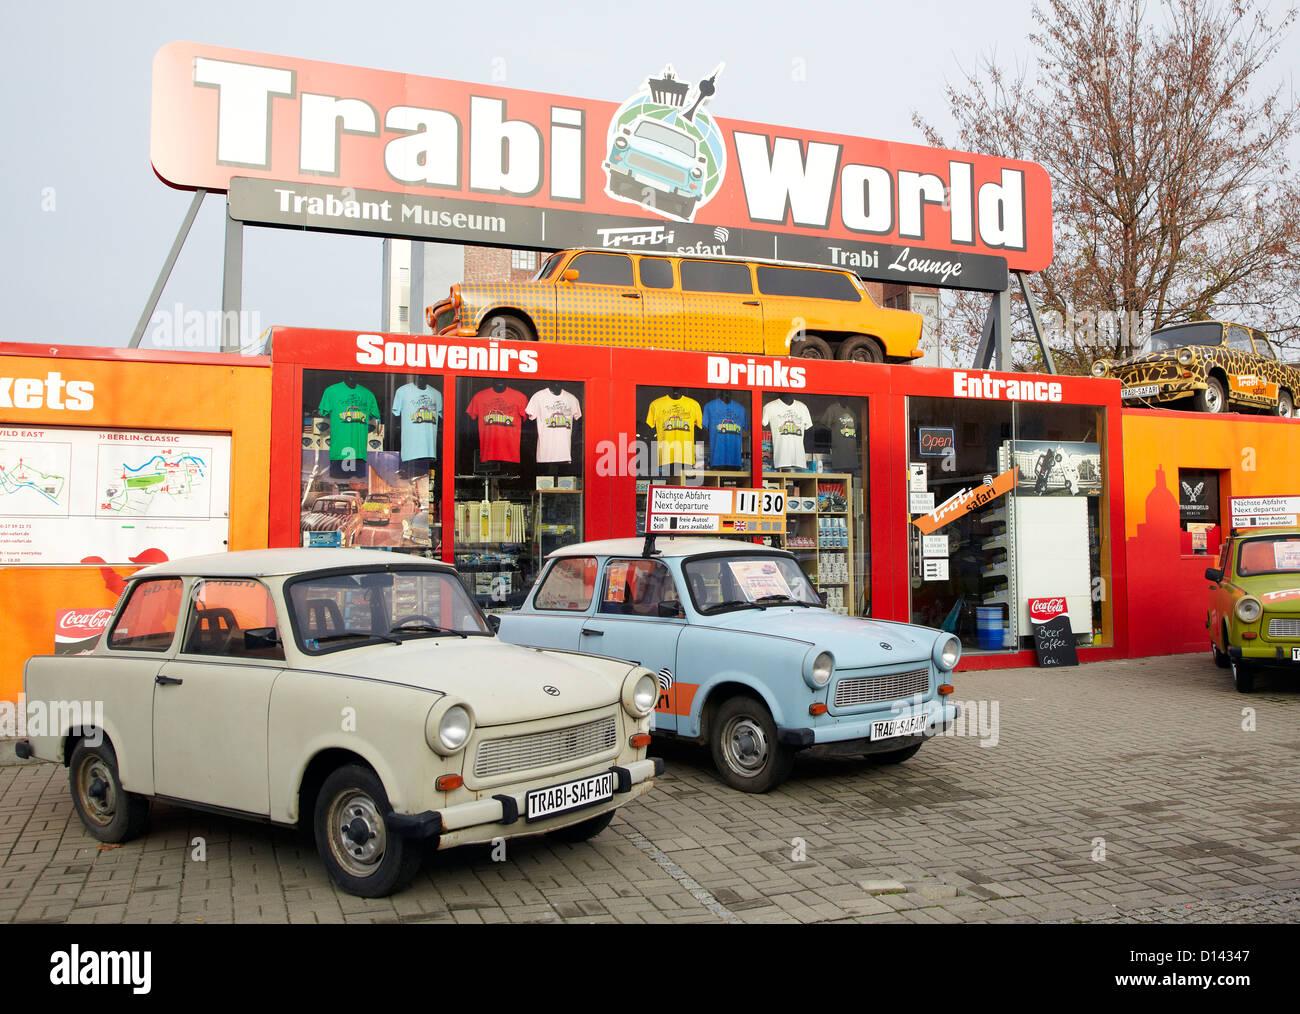 Trabant Car Museum de Berlín Oriental Alemania Imagen De Stock